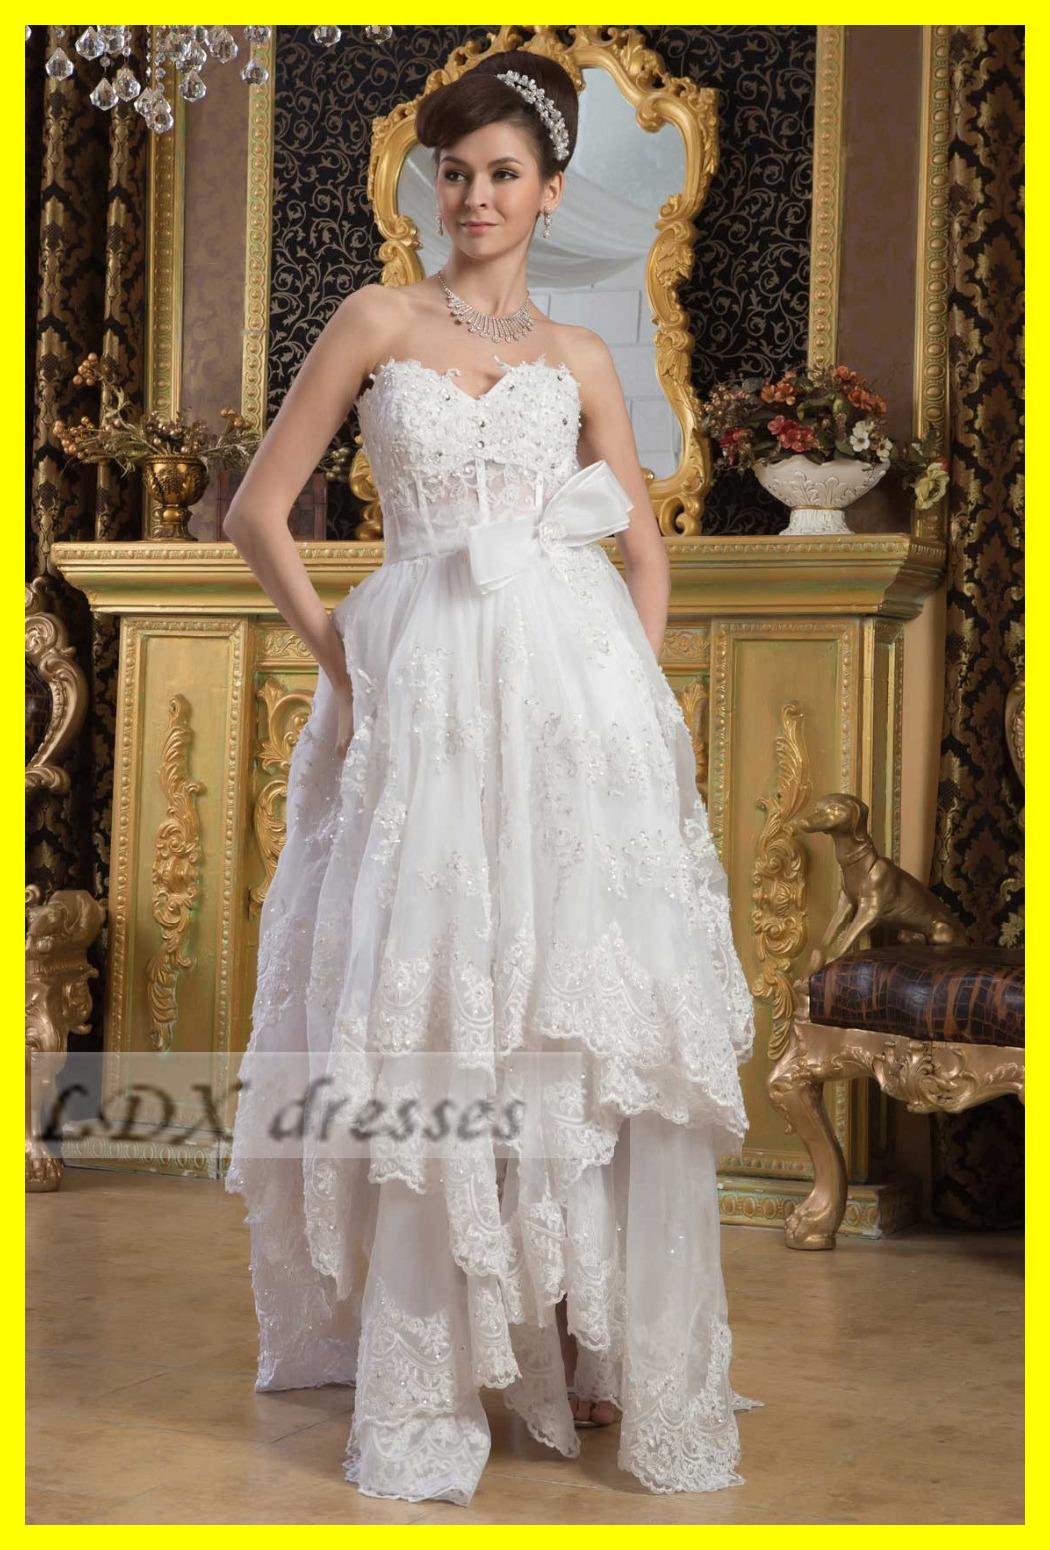 Off White Wedding Dresses Casual Beach Dress Baby Weddings A Line Floor Length None Appliques